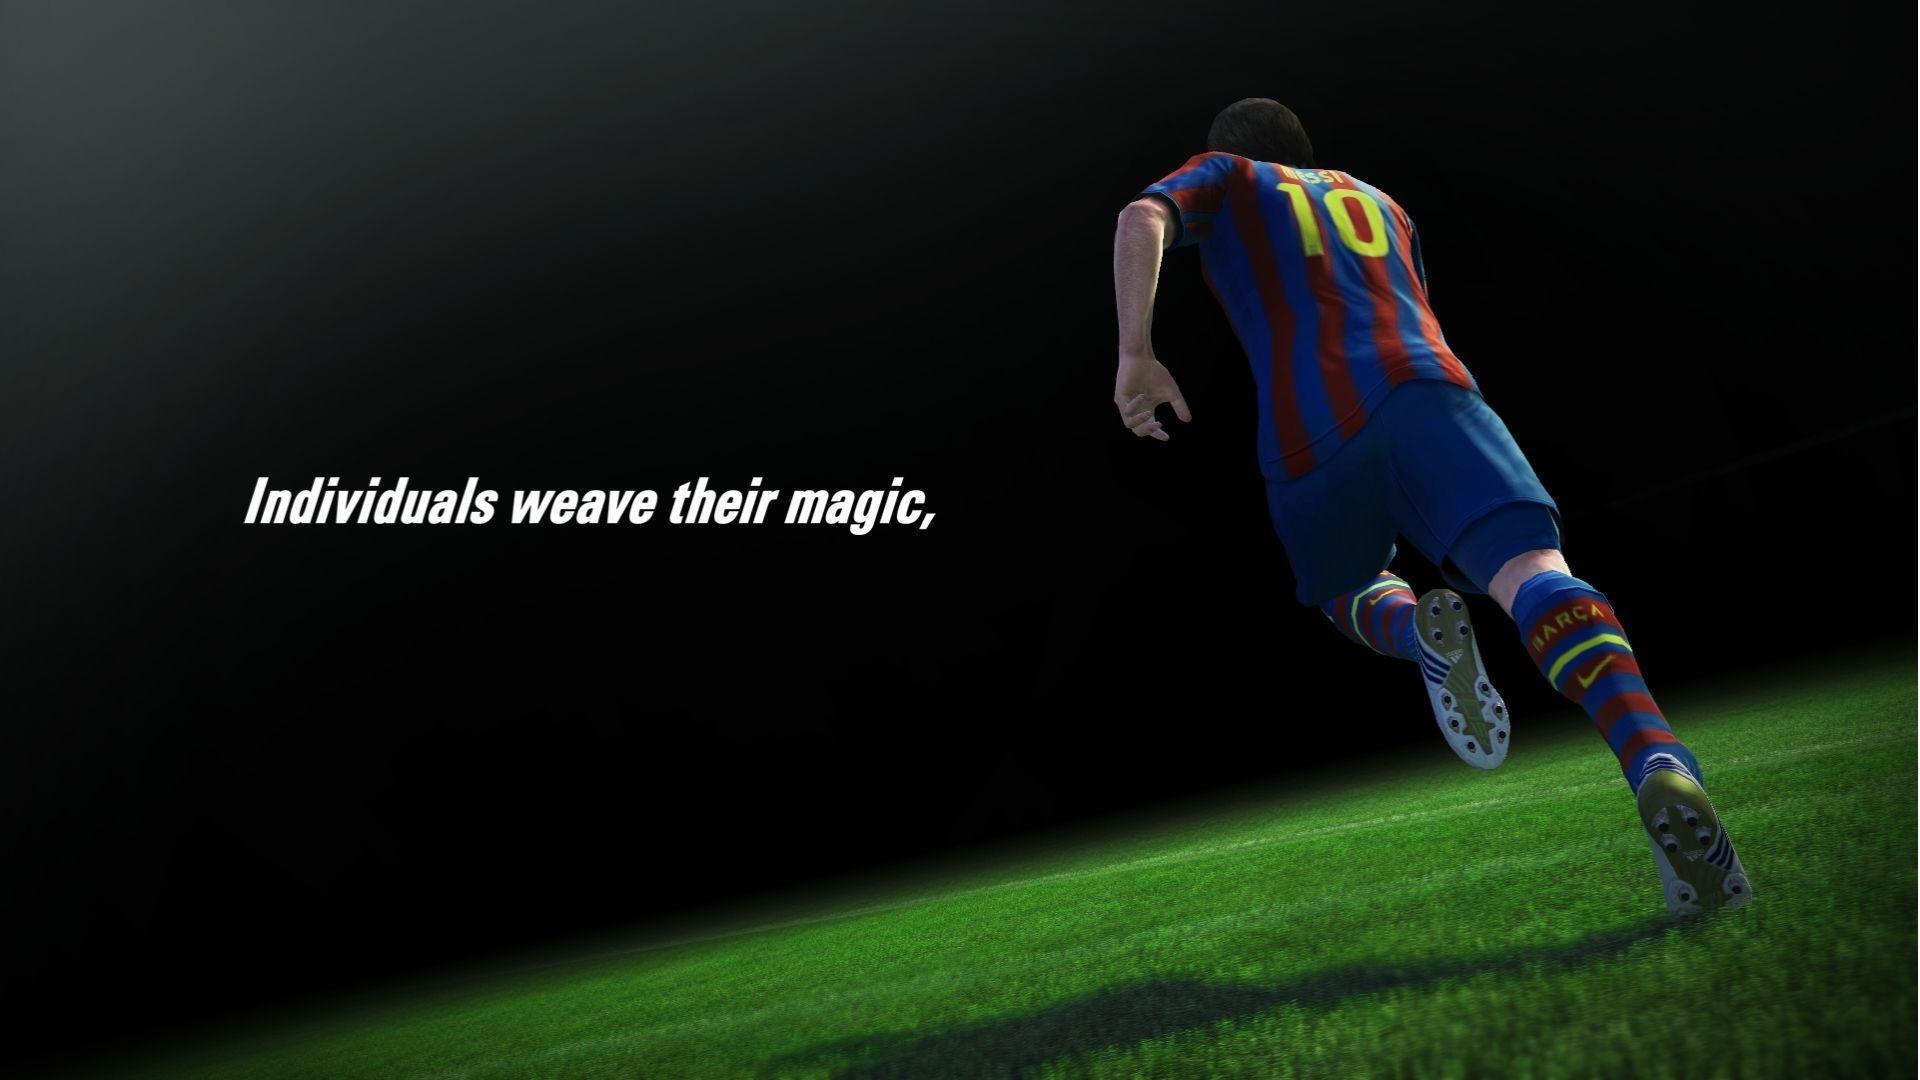 nike soccer wallpaper HD 1920x1080